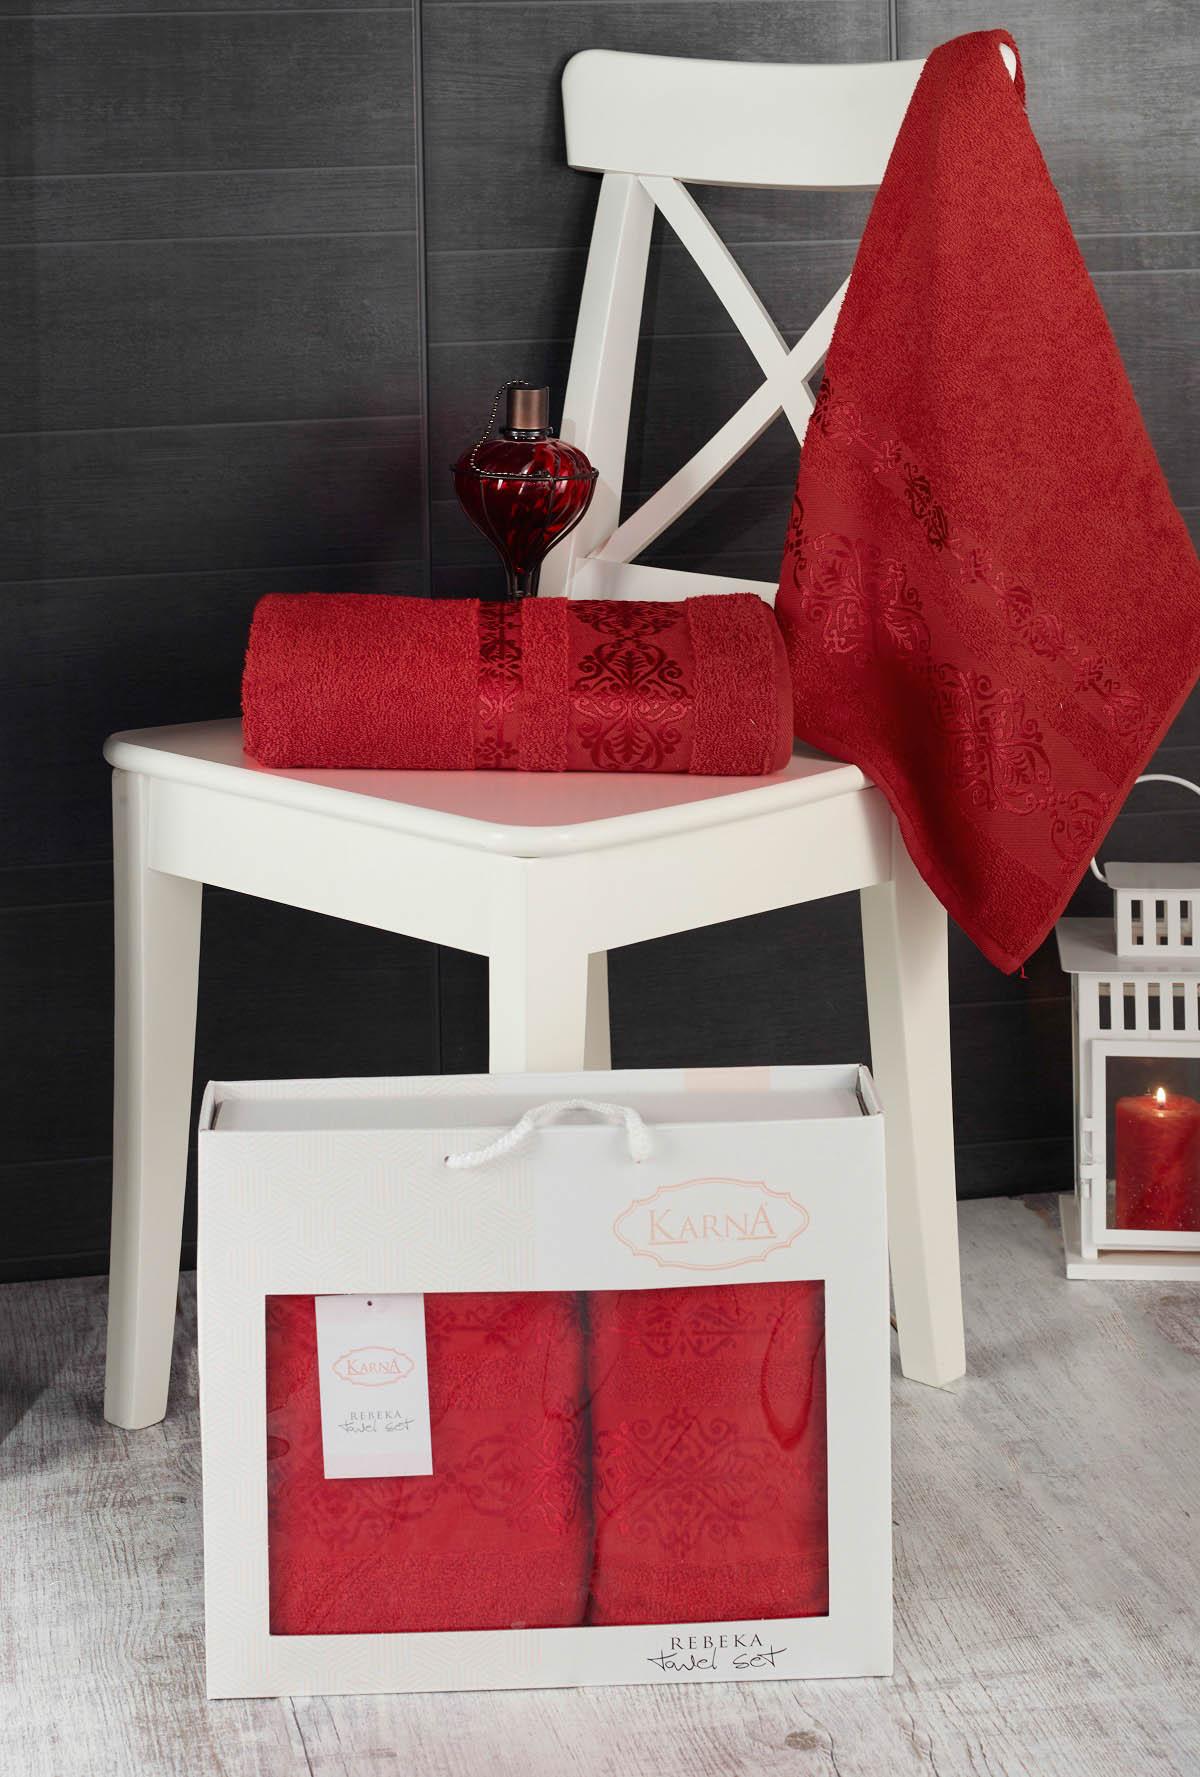 Полотенца Karna Полотенце Rebeca Цвет: Красный (50х90 см,70х140 см) набор из 3 полотенец merzuka sakura 50х90 2 70х140 8432 терракотовый